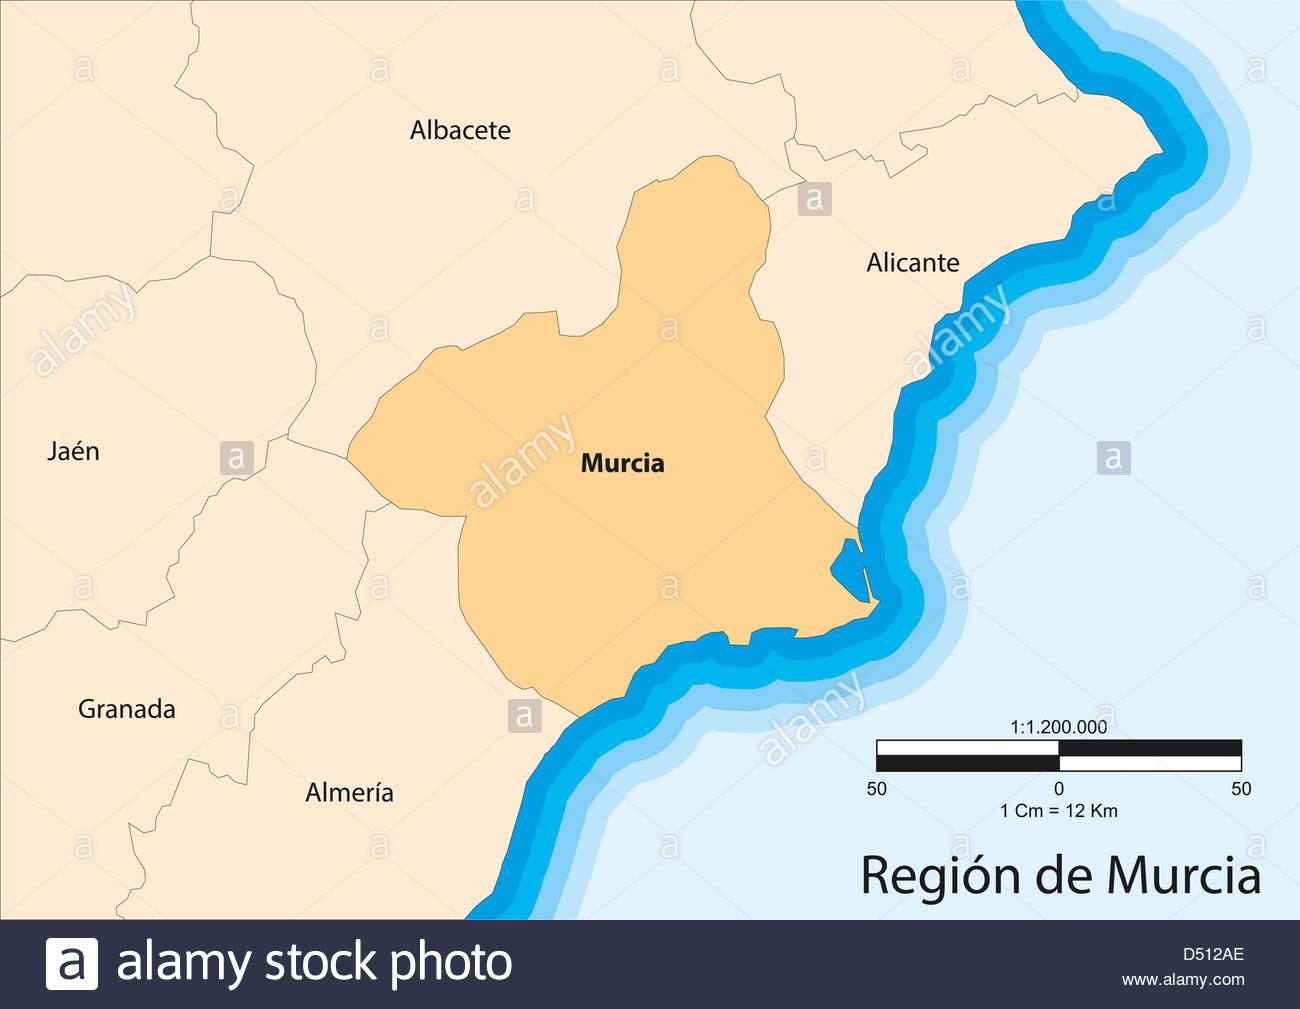 Mapa Region De Murcia.Vector Map Of Region Of Murcia Region De Murcia Spain